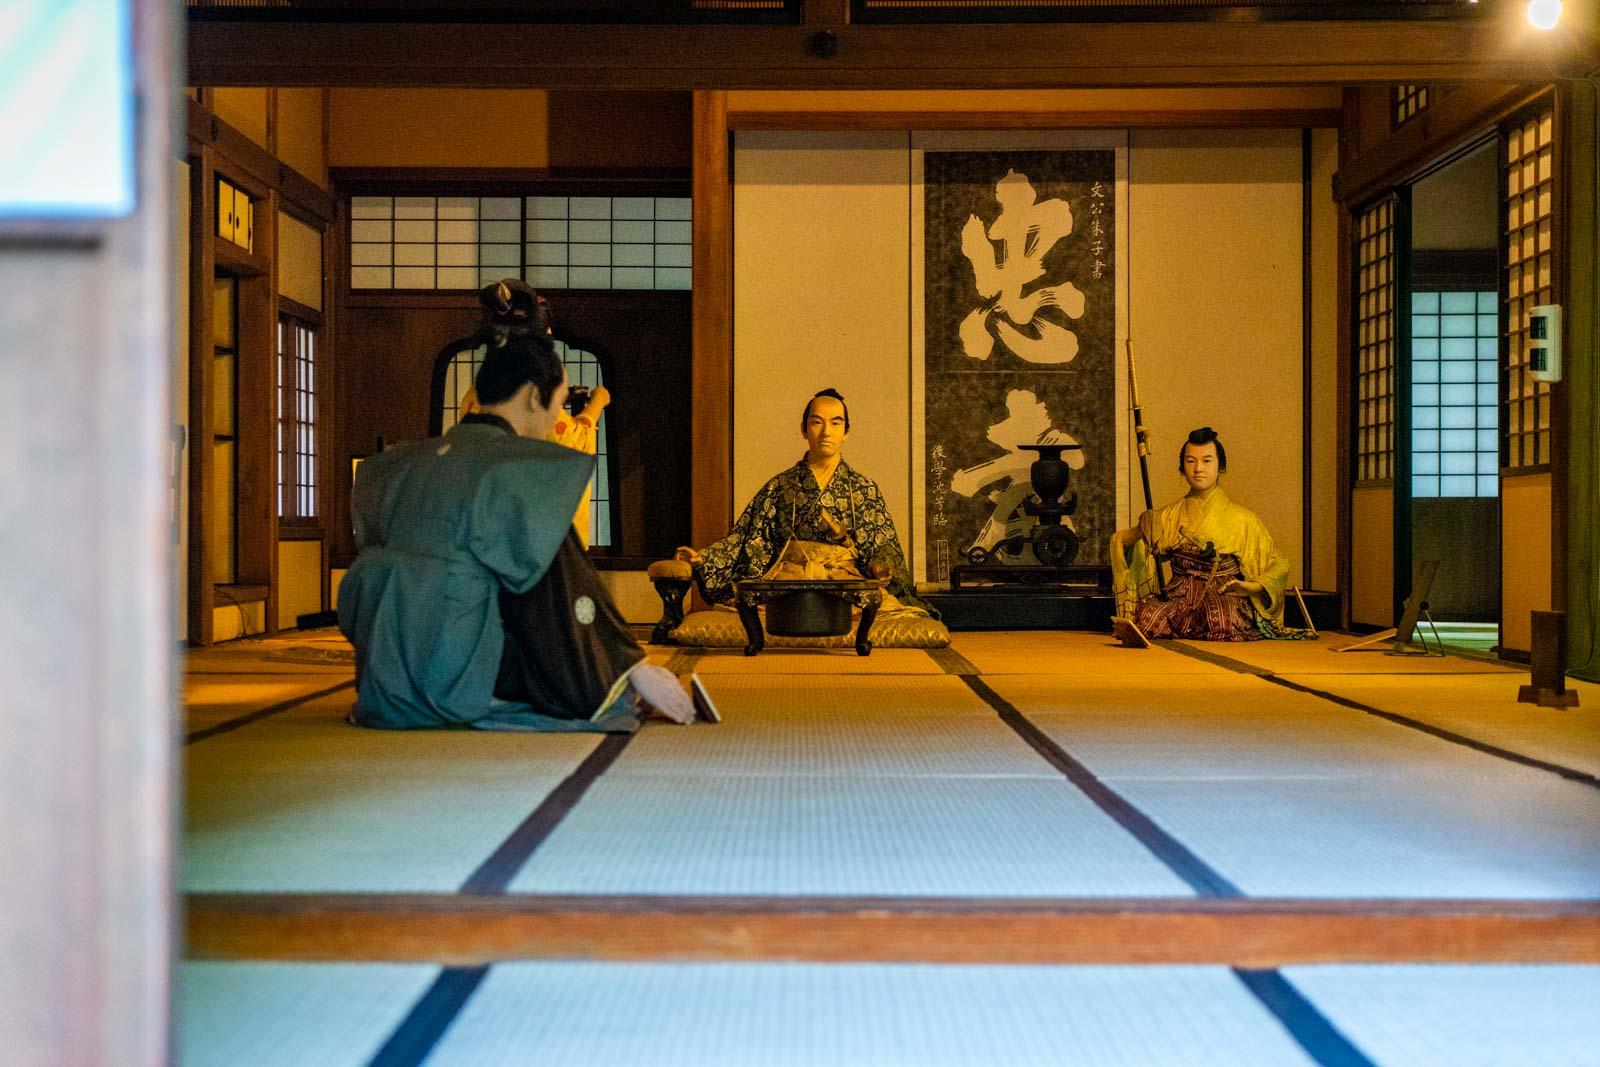 Bukeyashiki Samurai residence, Aizu, Japan